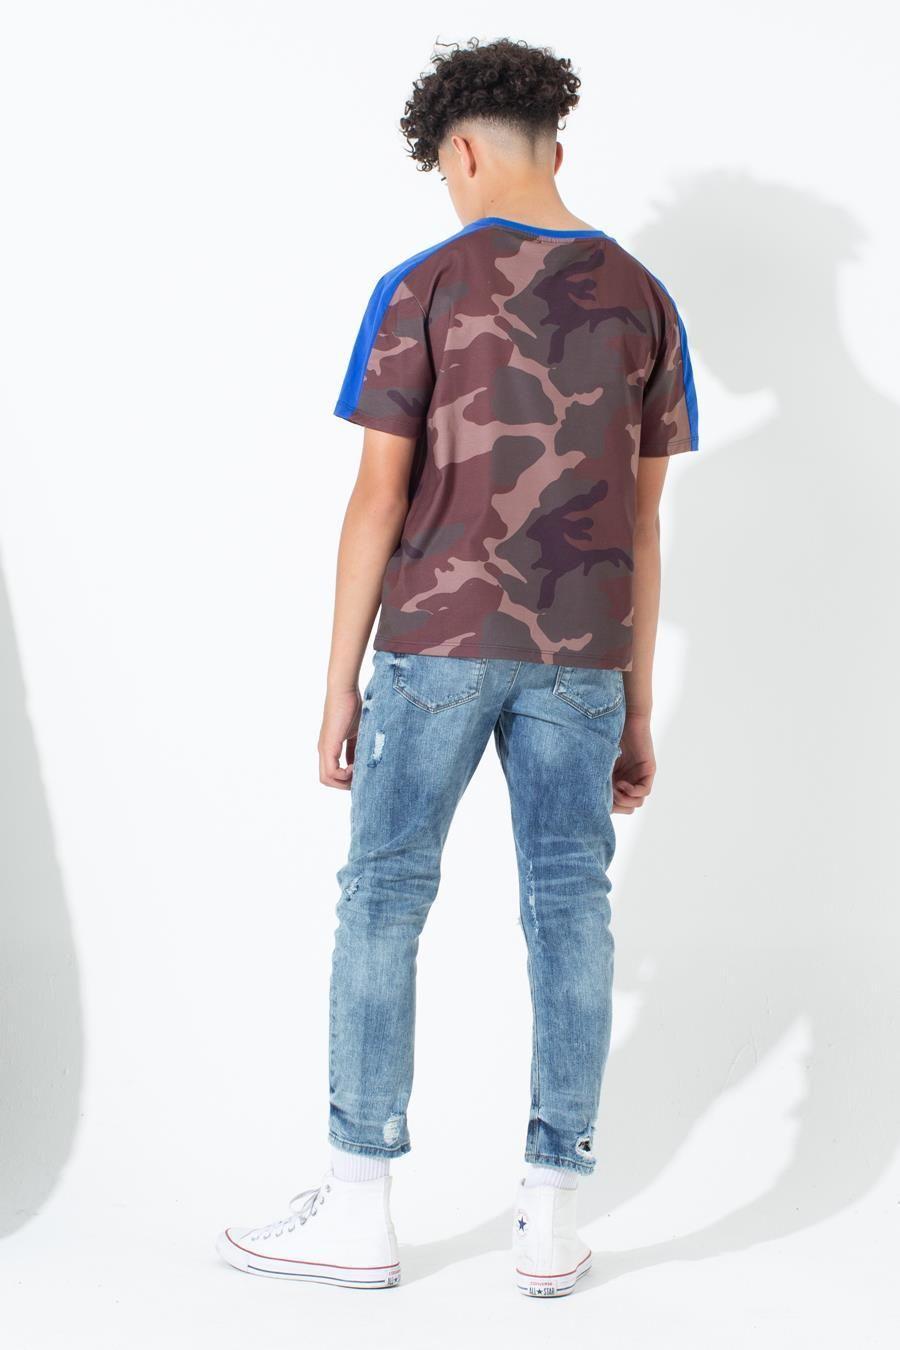 Hype Northern Camo Kids T-Shirt